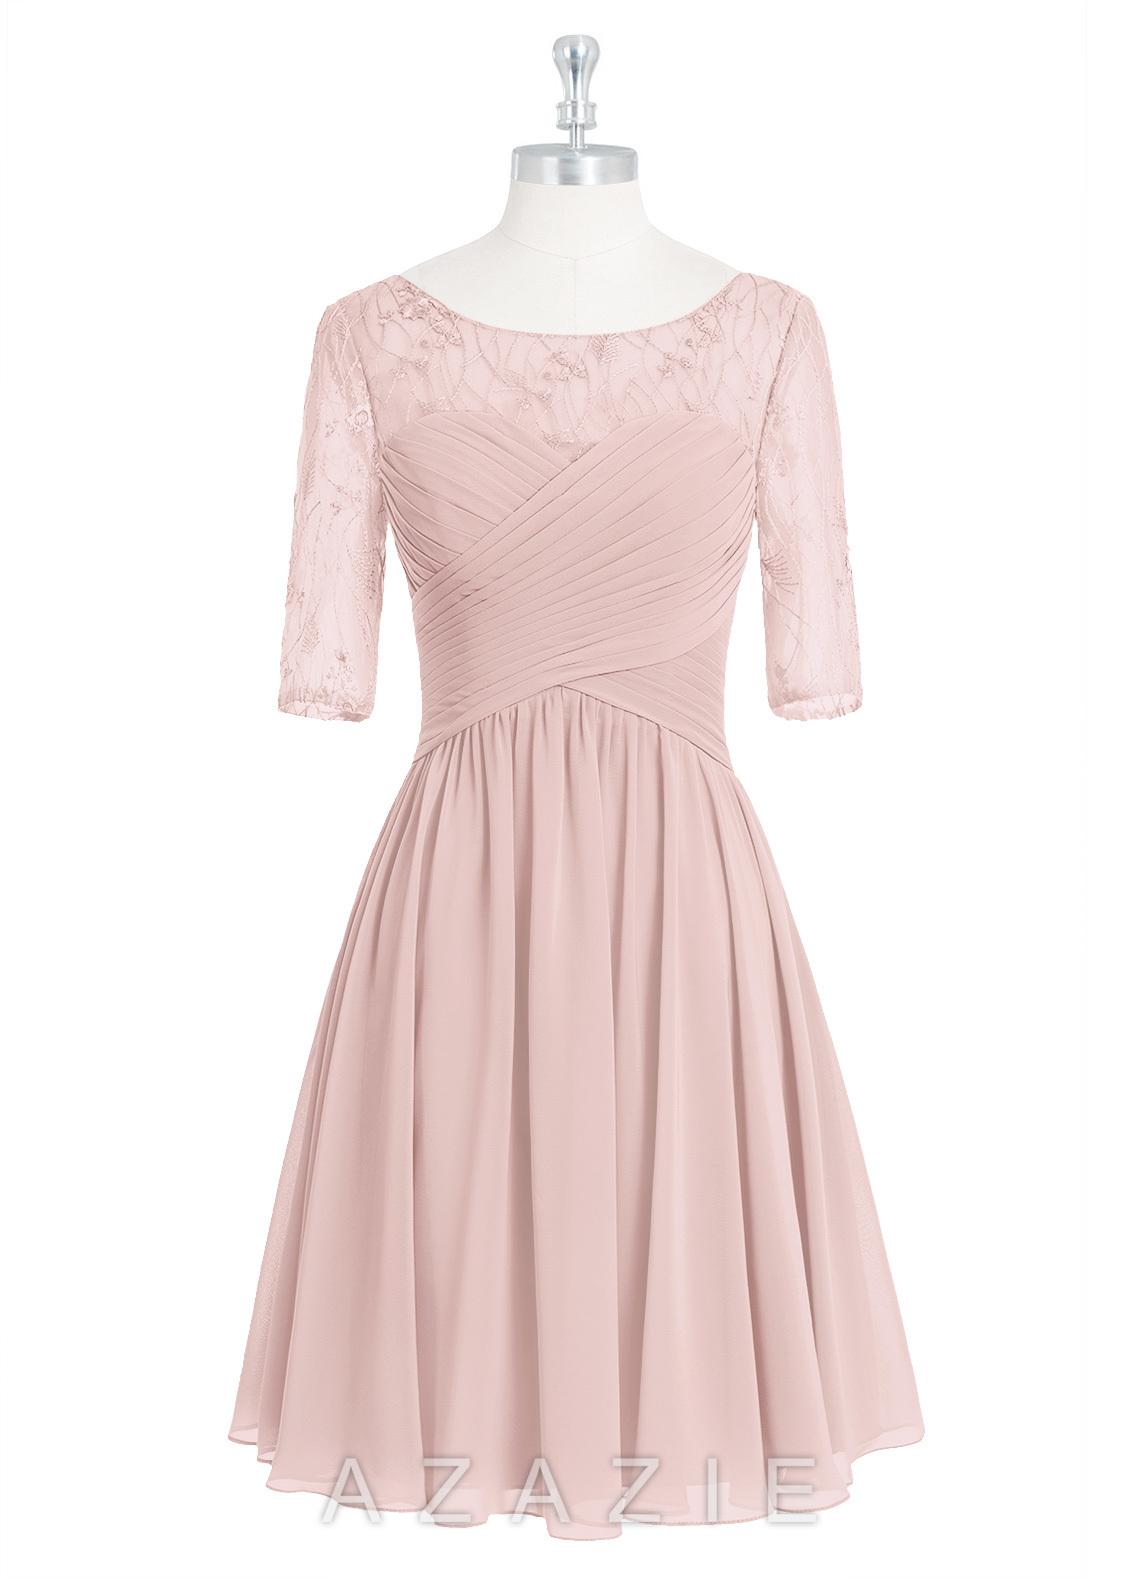 Azazie Hattie Bridesmaid Dresses 28b087f39